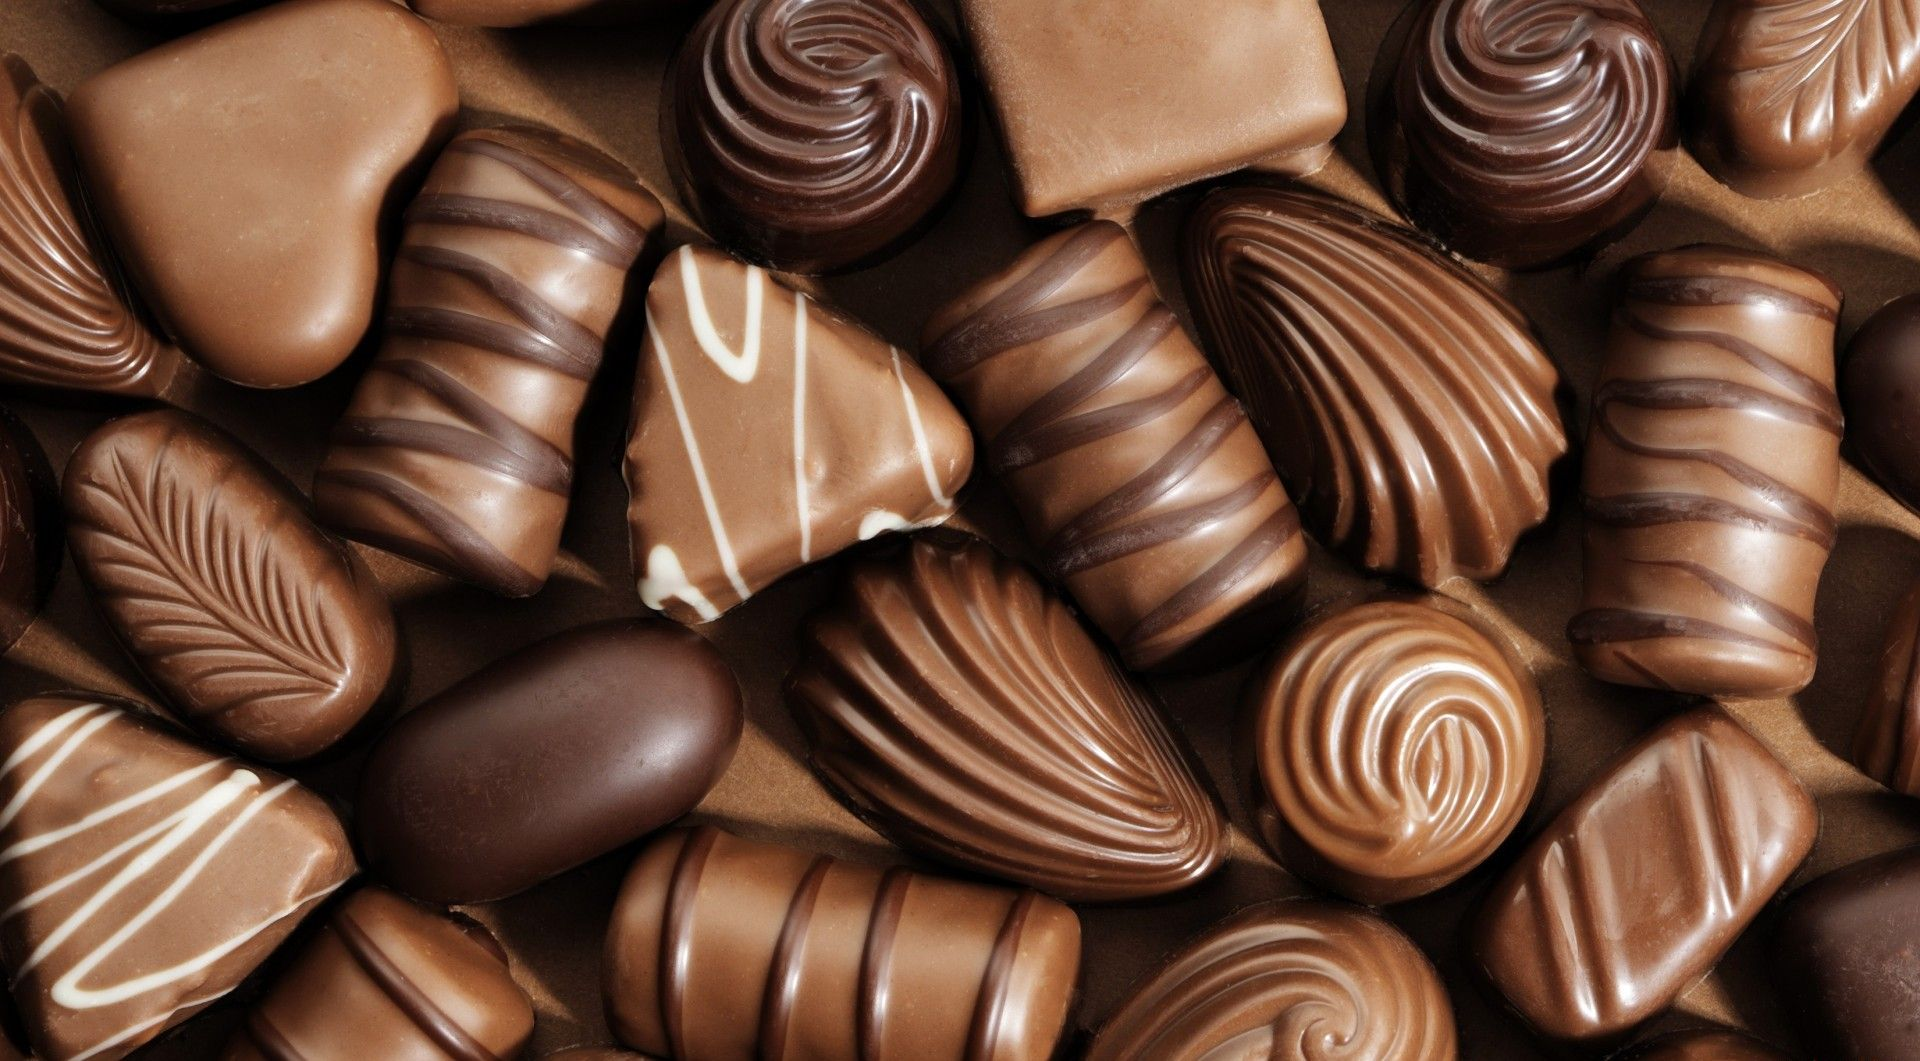 Chocolate Wallpaper Chocolate Chocolate Sweets Chocolate Chocolate Candy